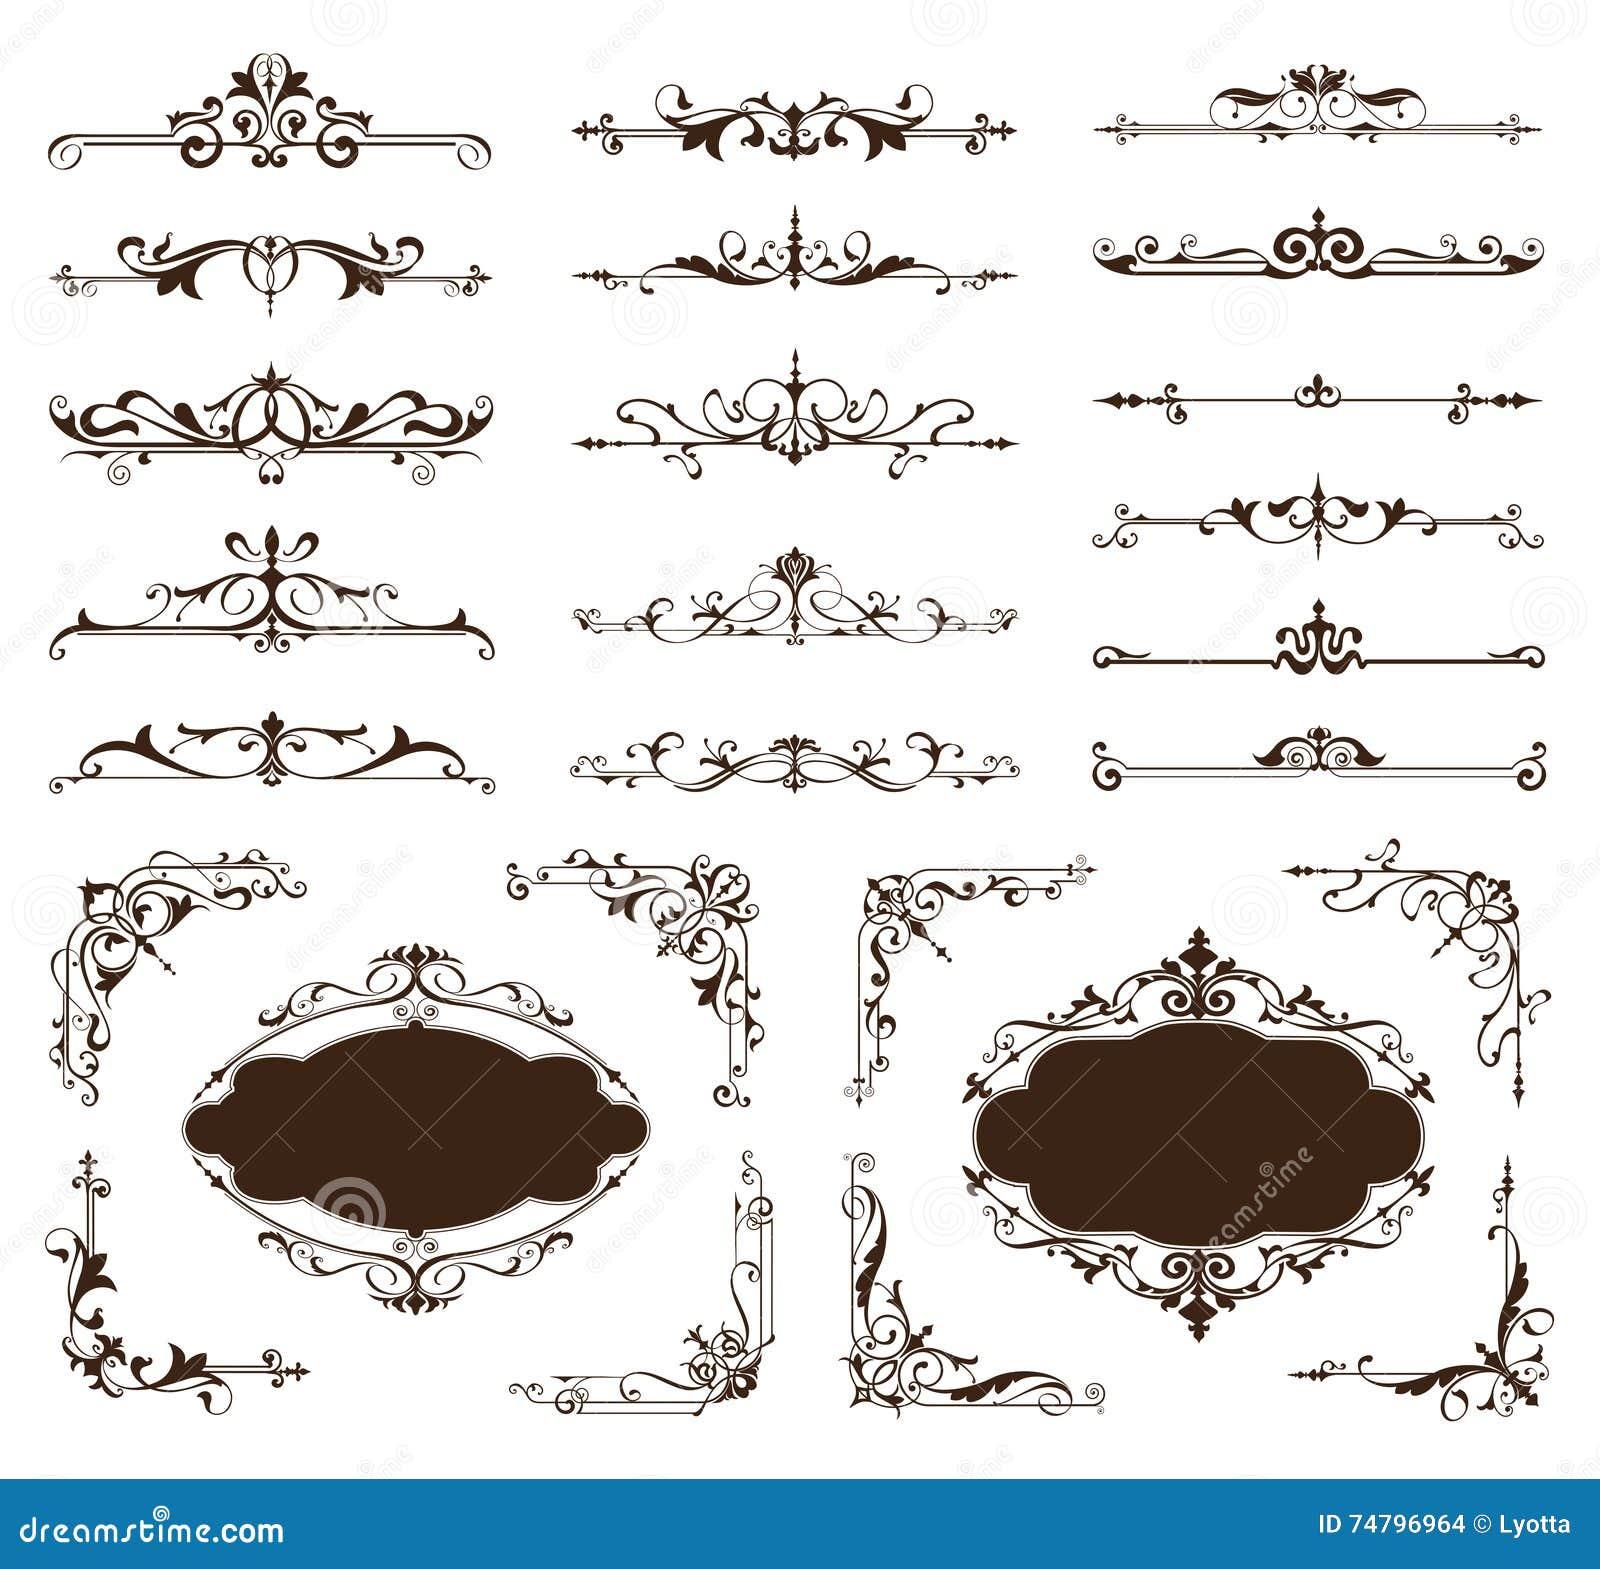 Ornamental design borders and corners Vector set of vintage ornaments